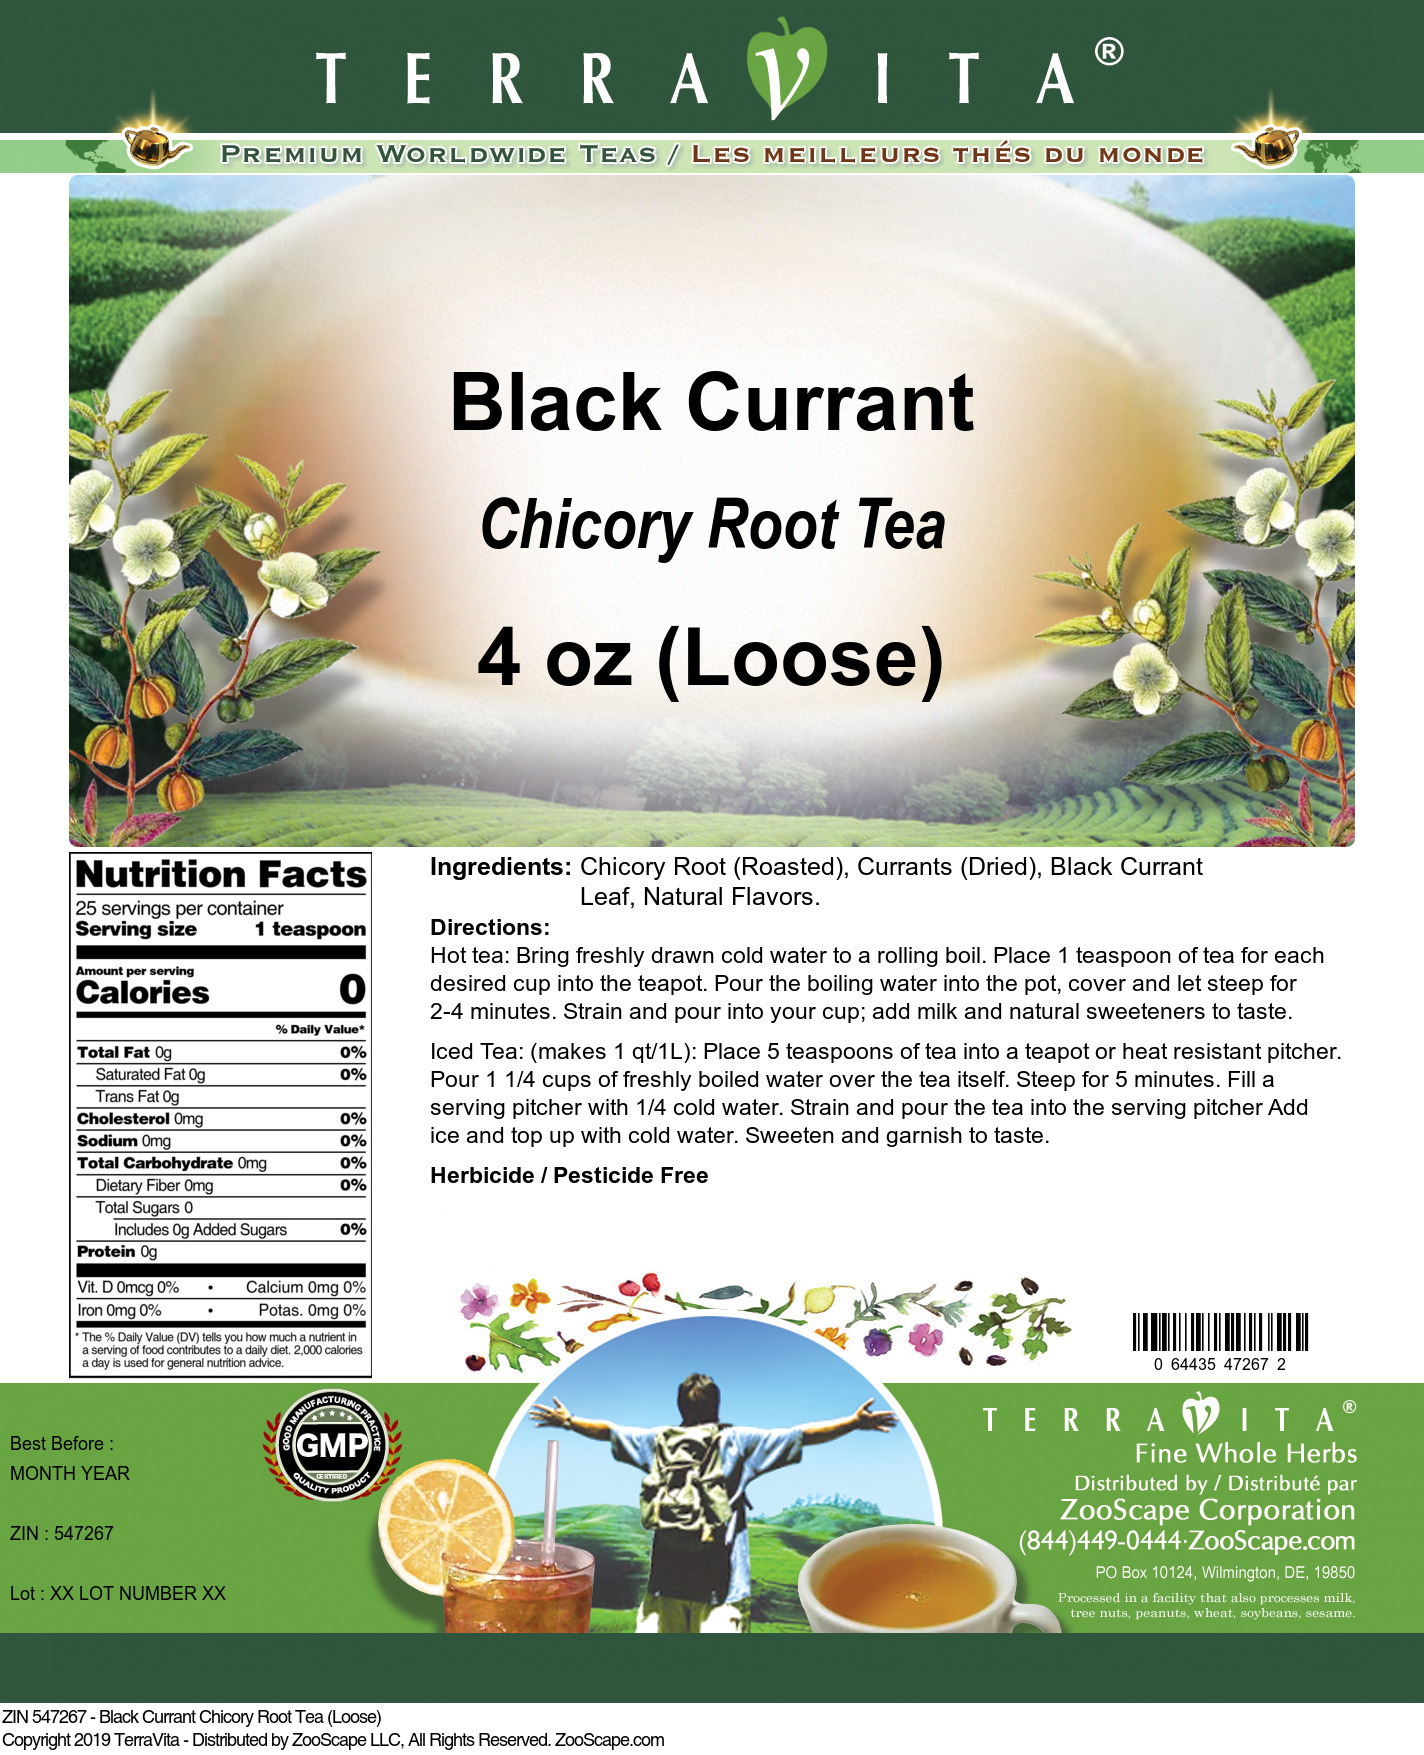 Black Currant Chicory Root Tea (Loose)